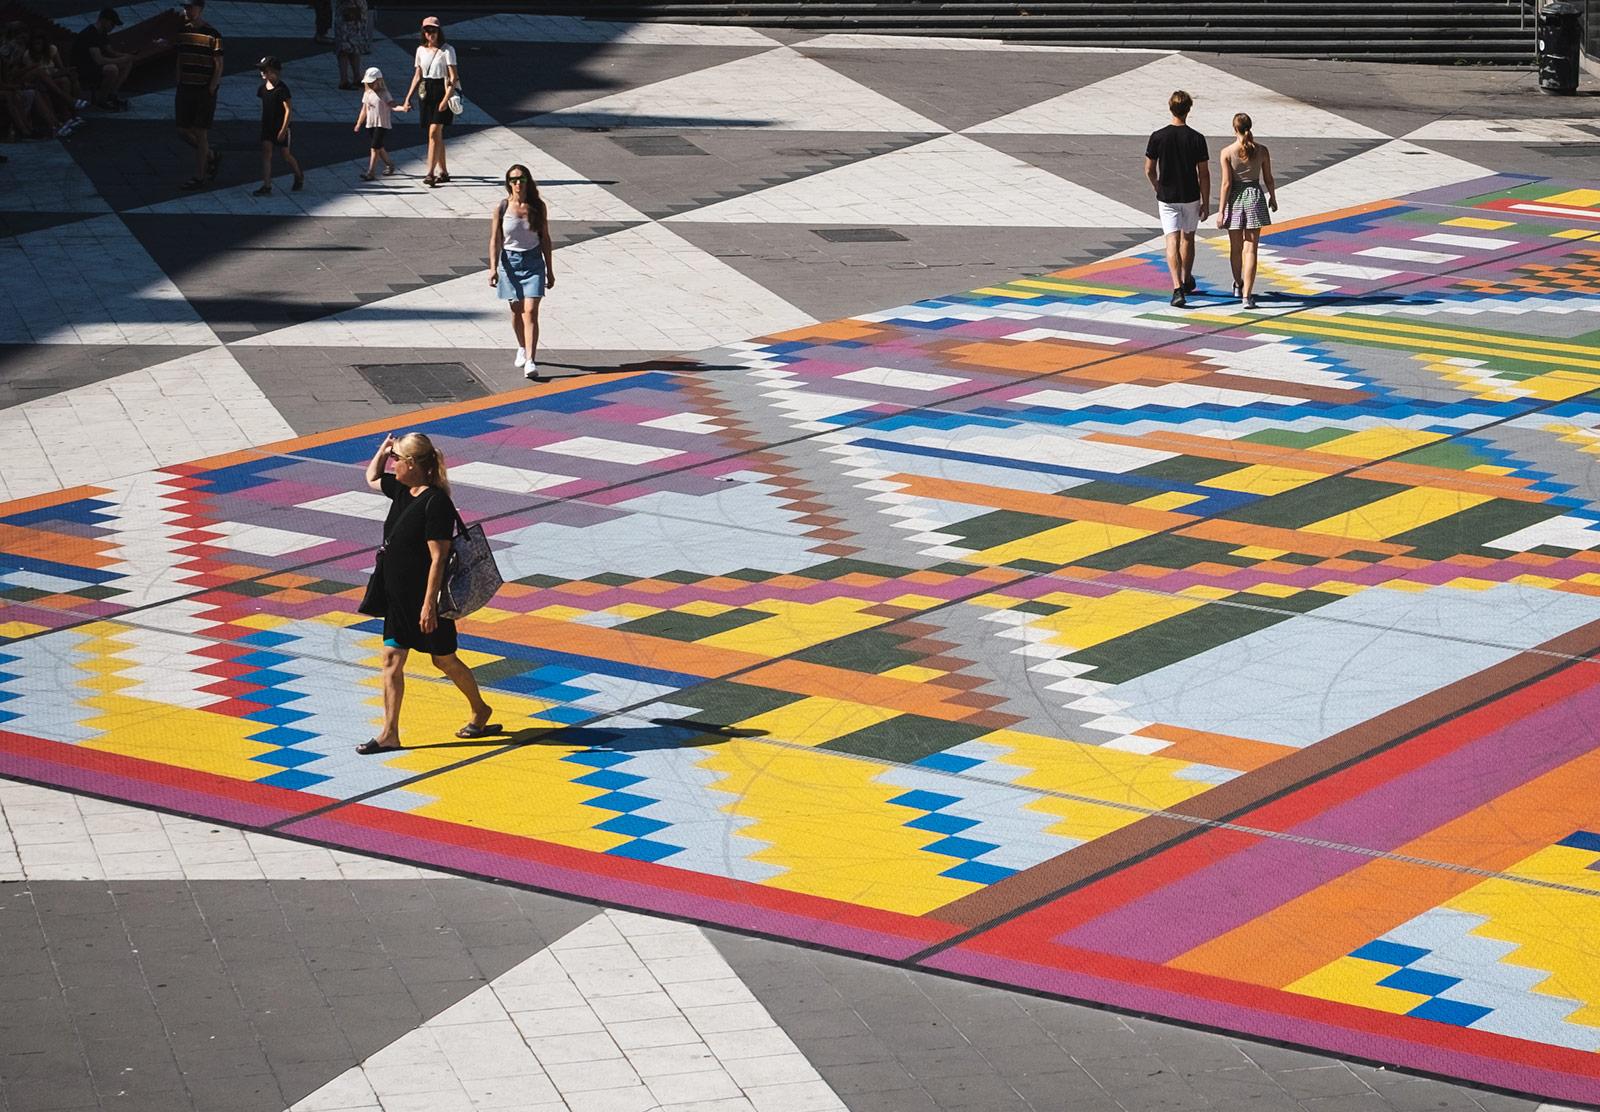 People walking on colourful floor